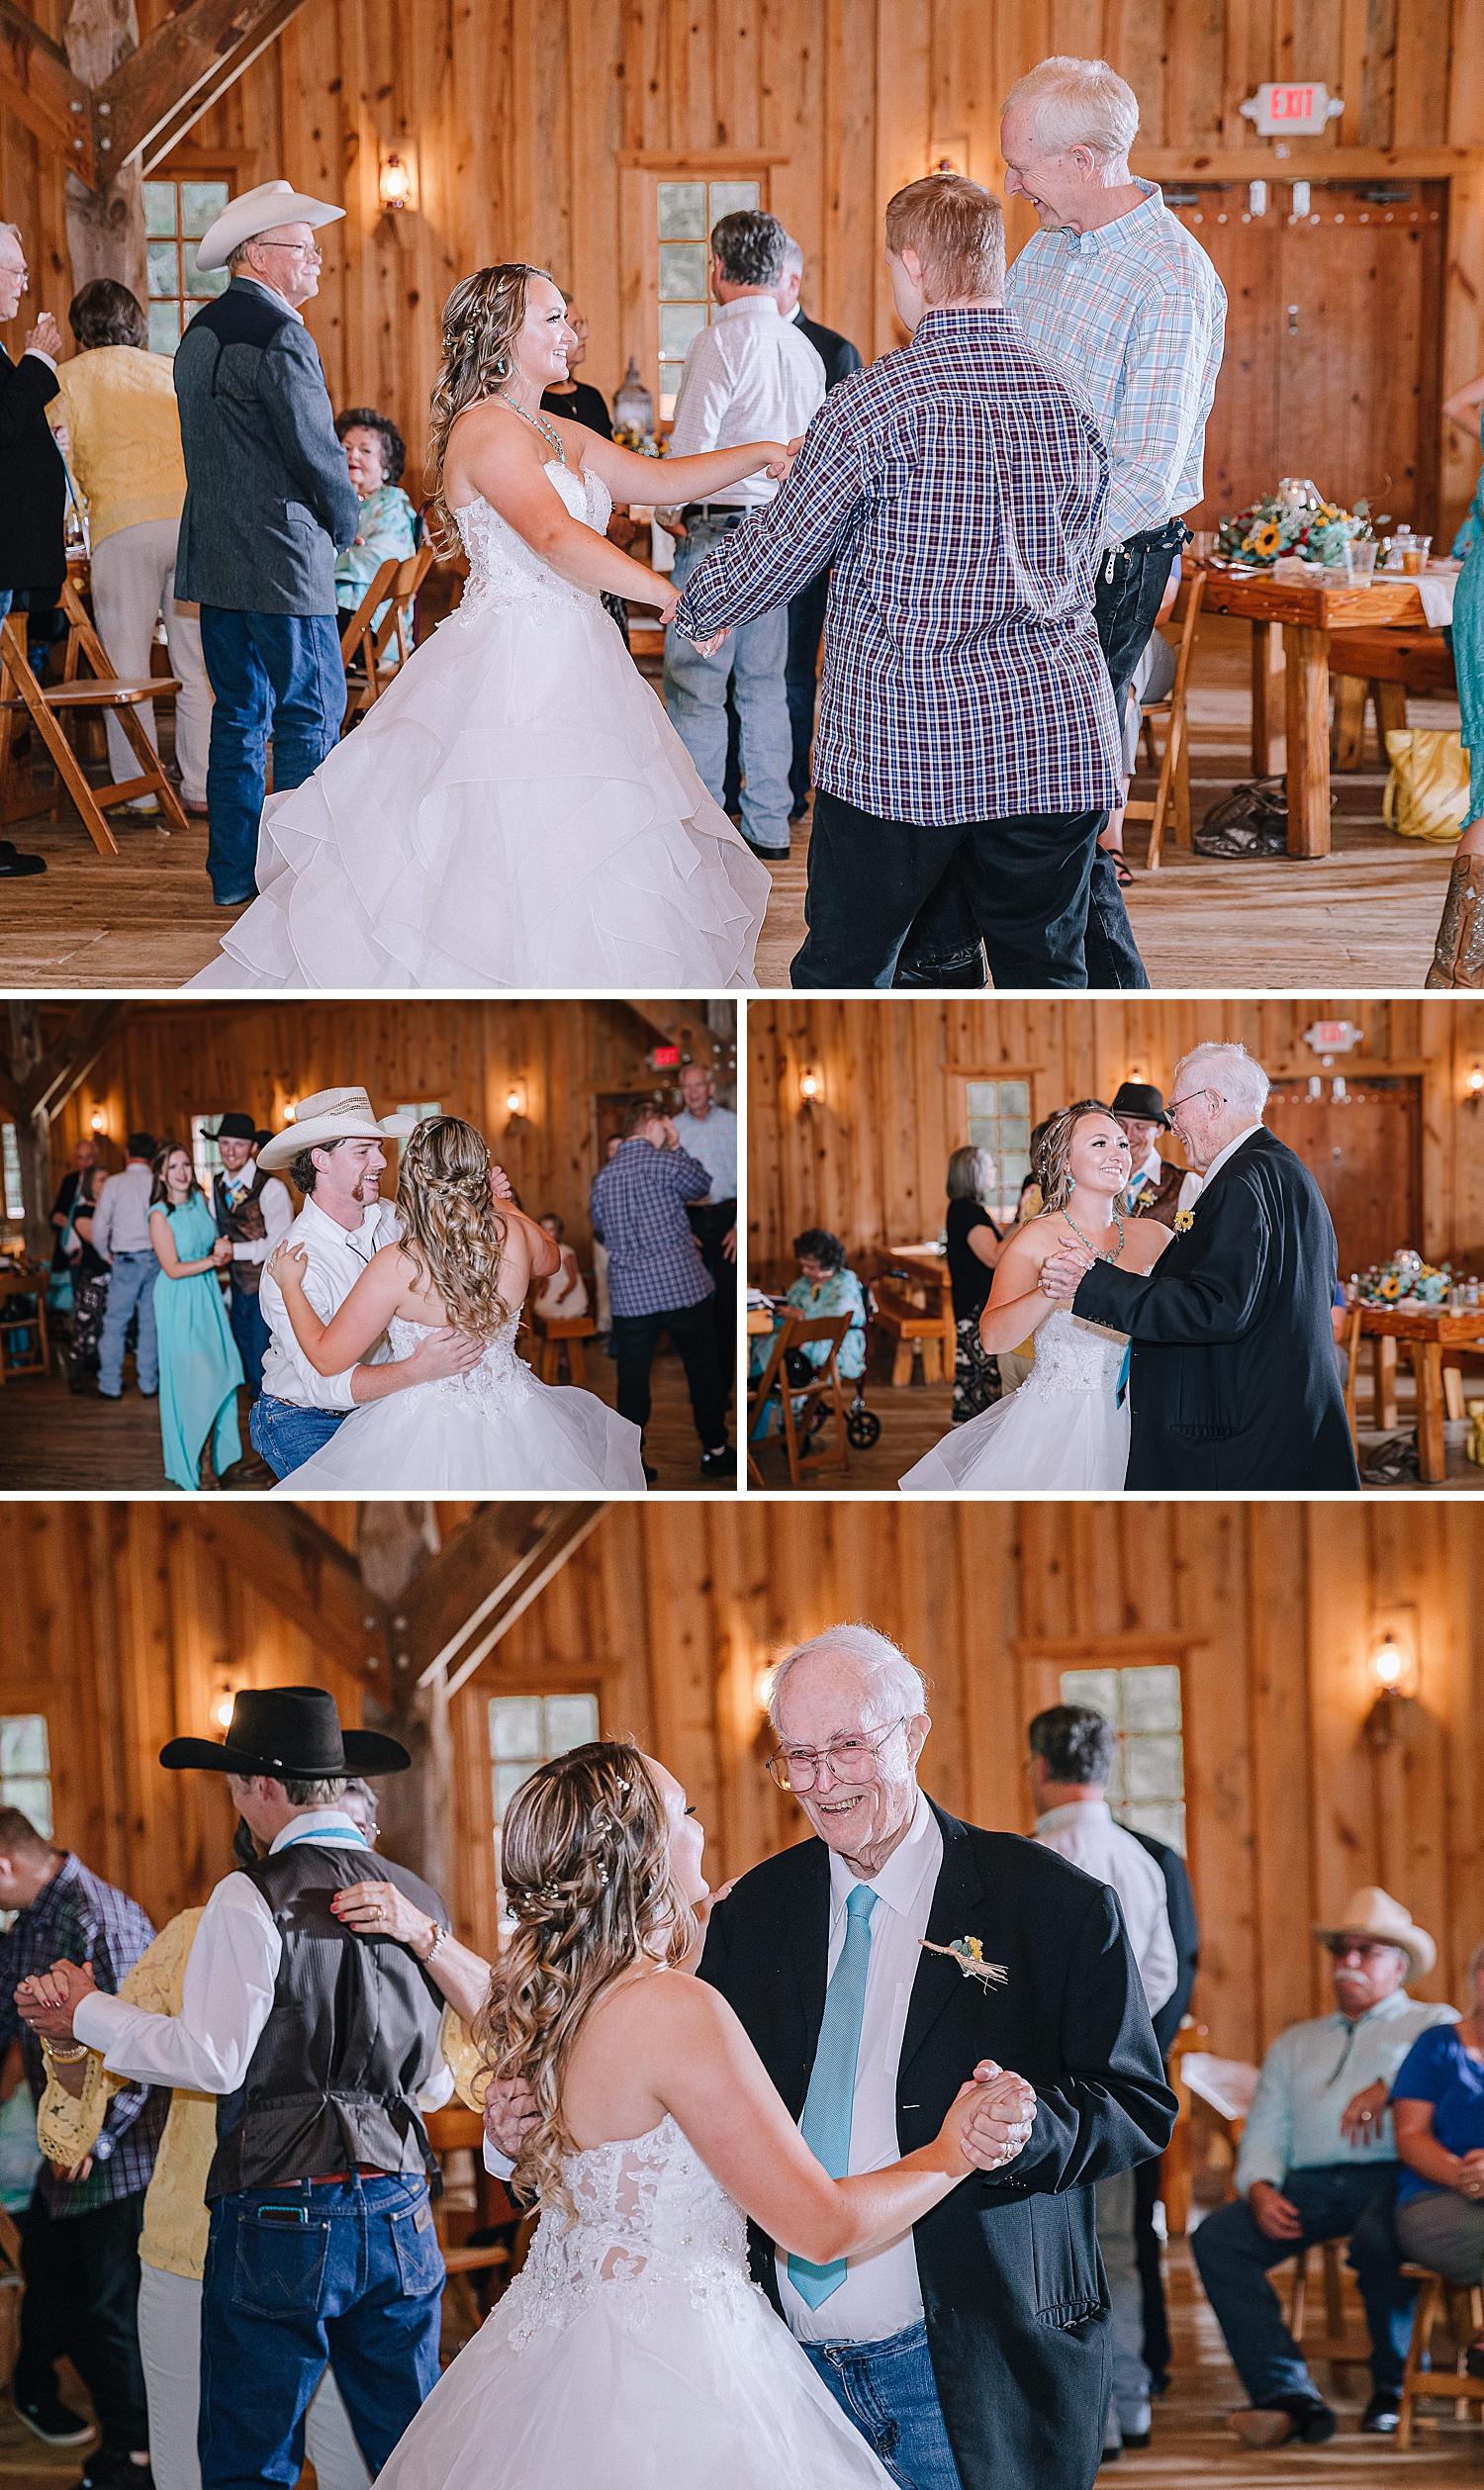 Carly-Barton-Photography-Old-Town-Texas-Rustic-Wedding-Photos-Sunflowers-Boots-Kyle-Texas_0076.jpg